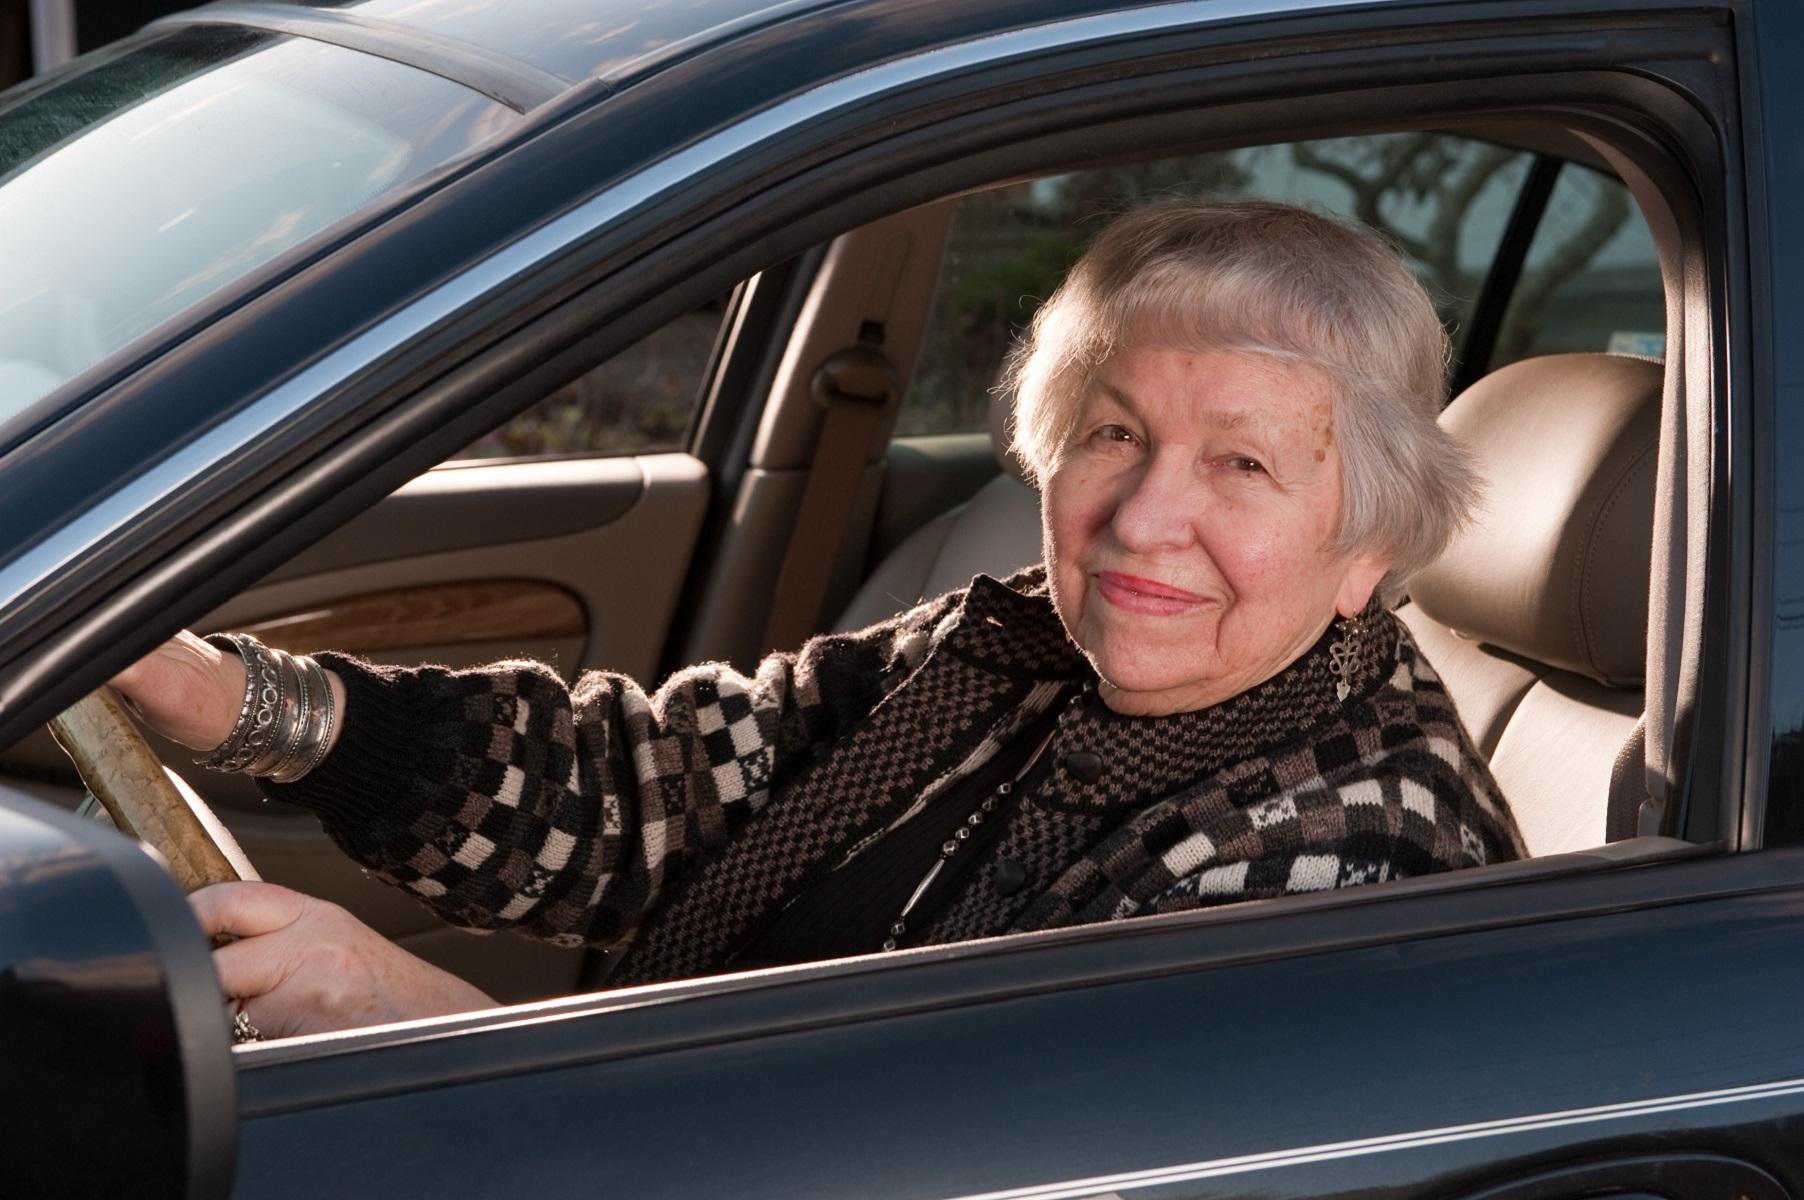 senior woman behind the wheel of car